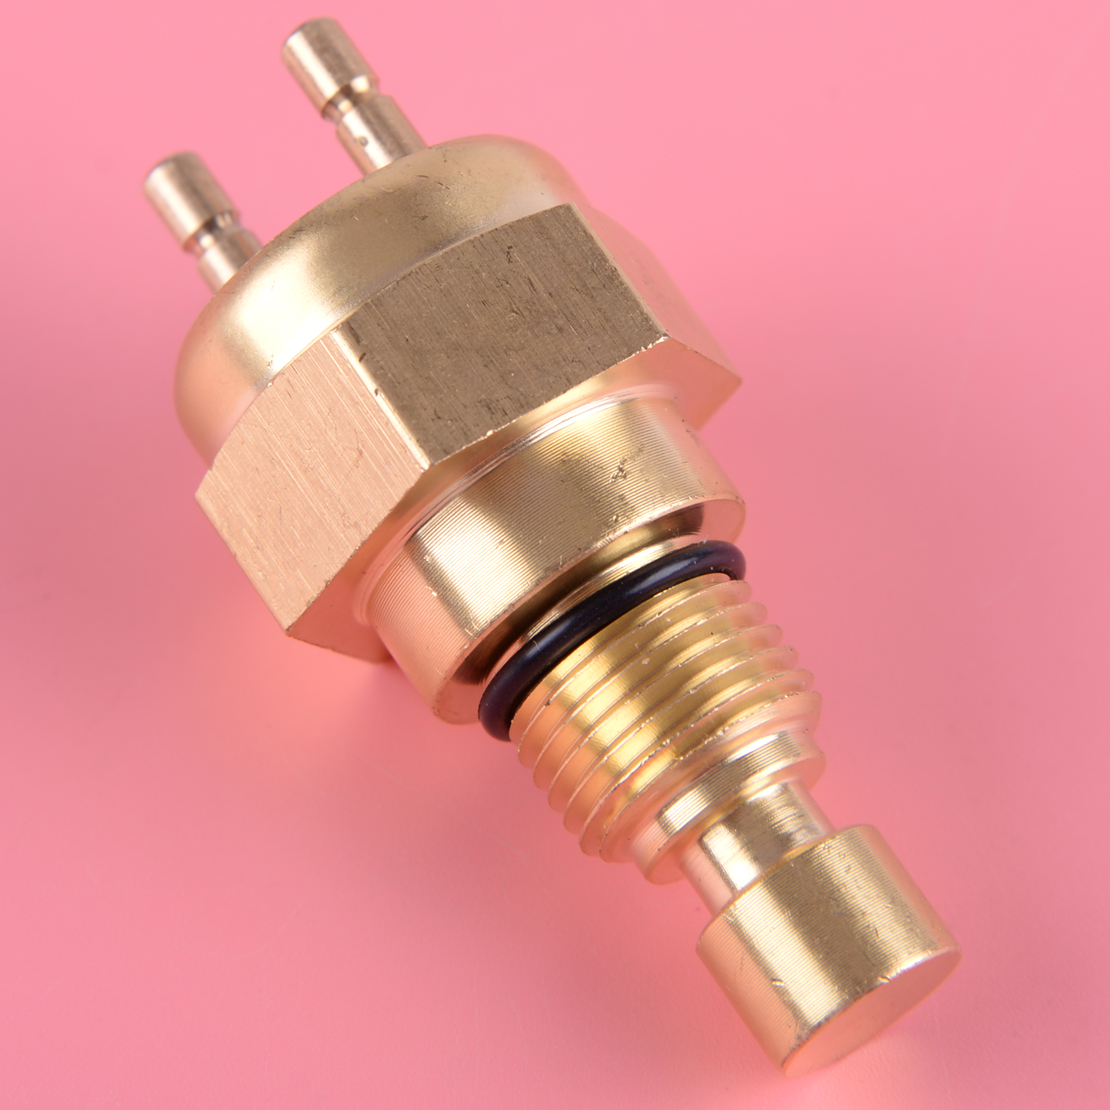 Radiator Fan Switch Sensor For Kawasaki Prairie KVF400 KVF650 Replace 27010-1202